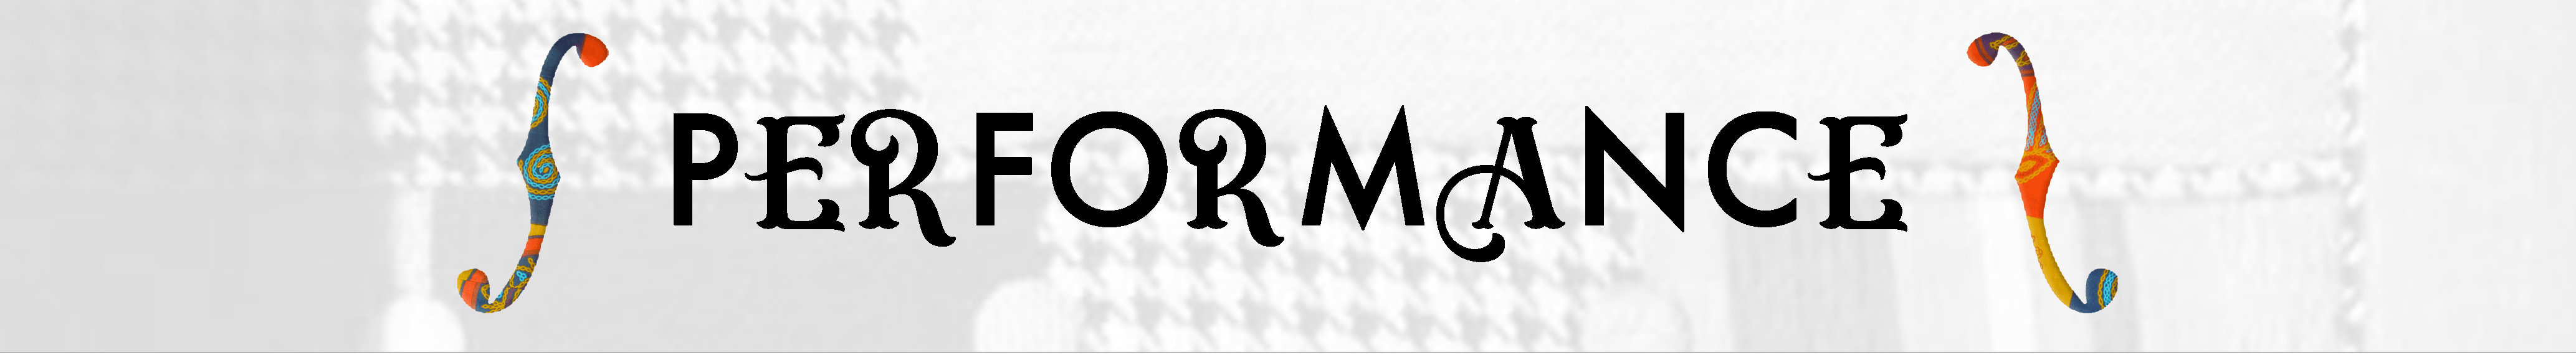 PERFORMANCE-min